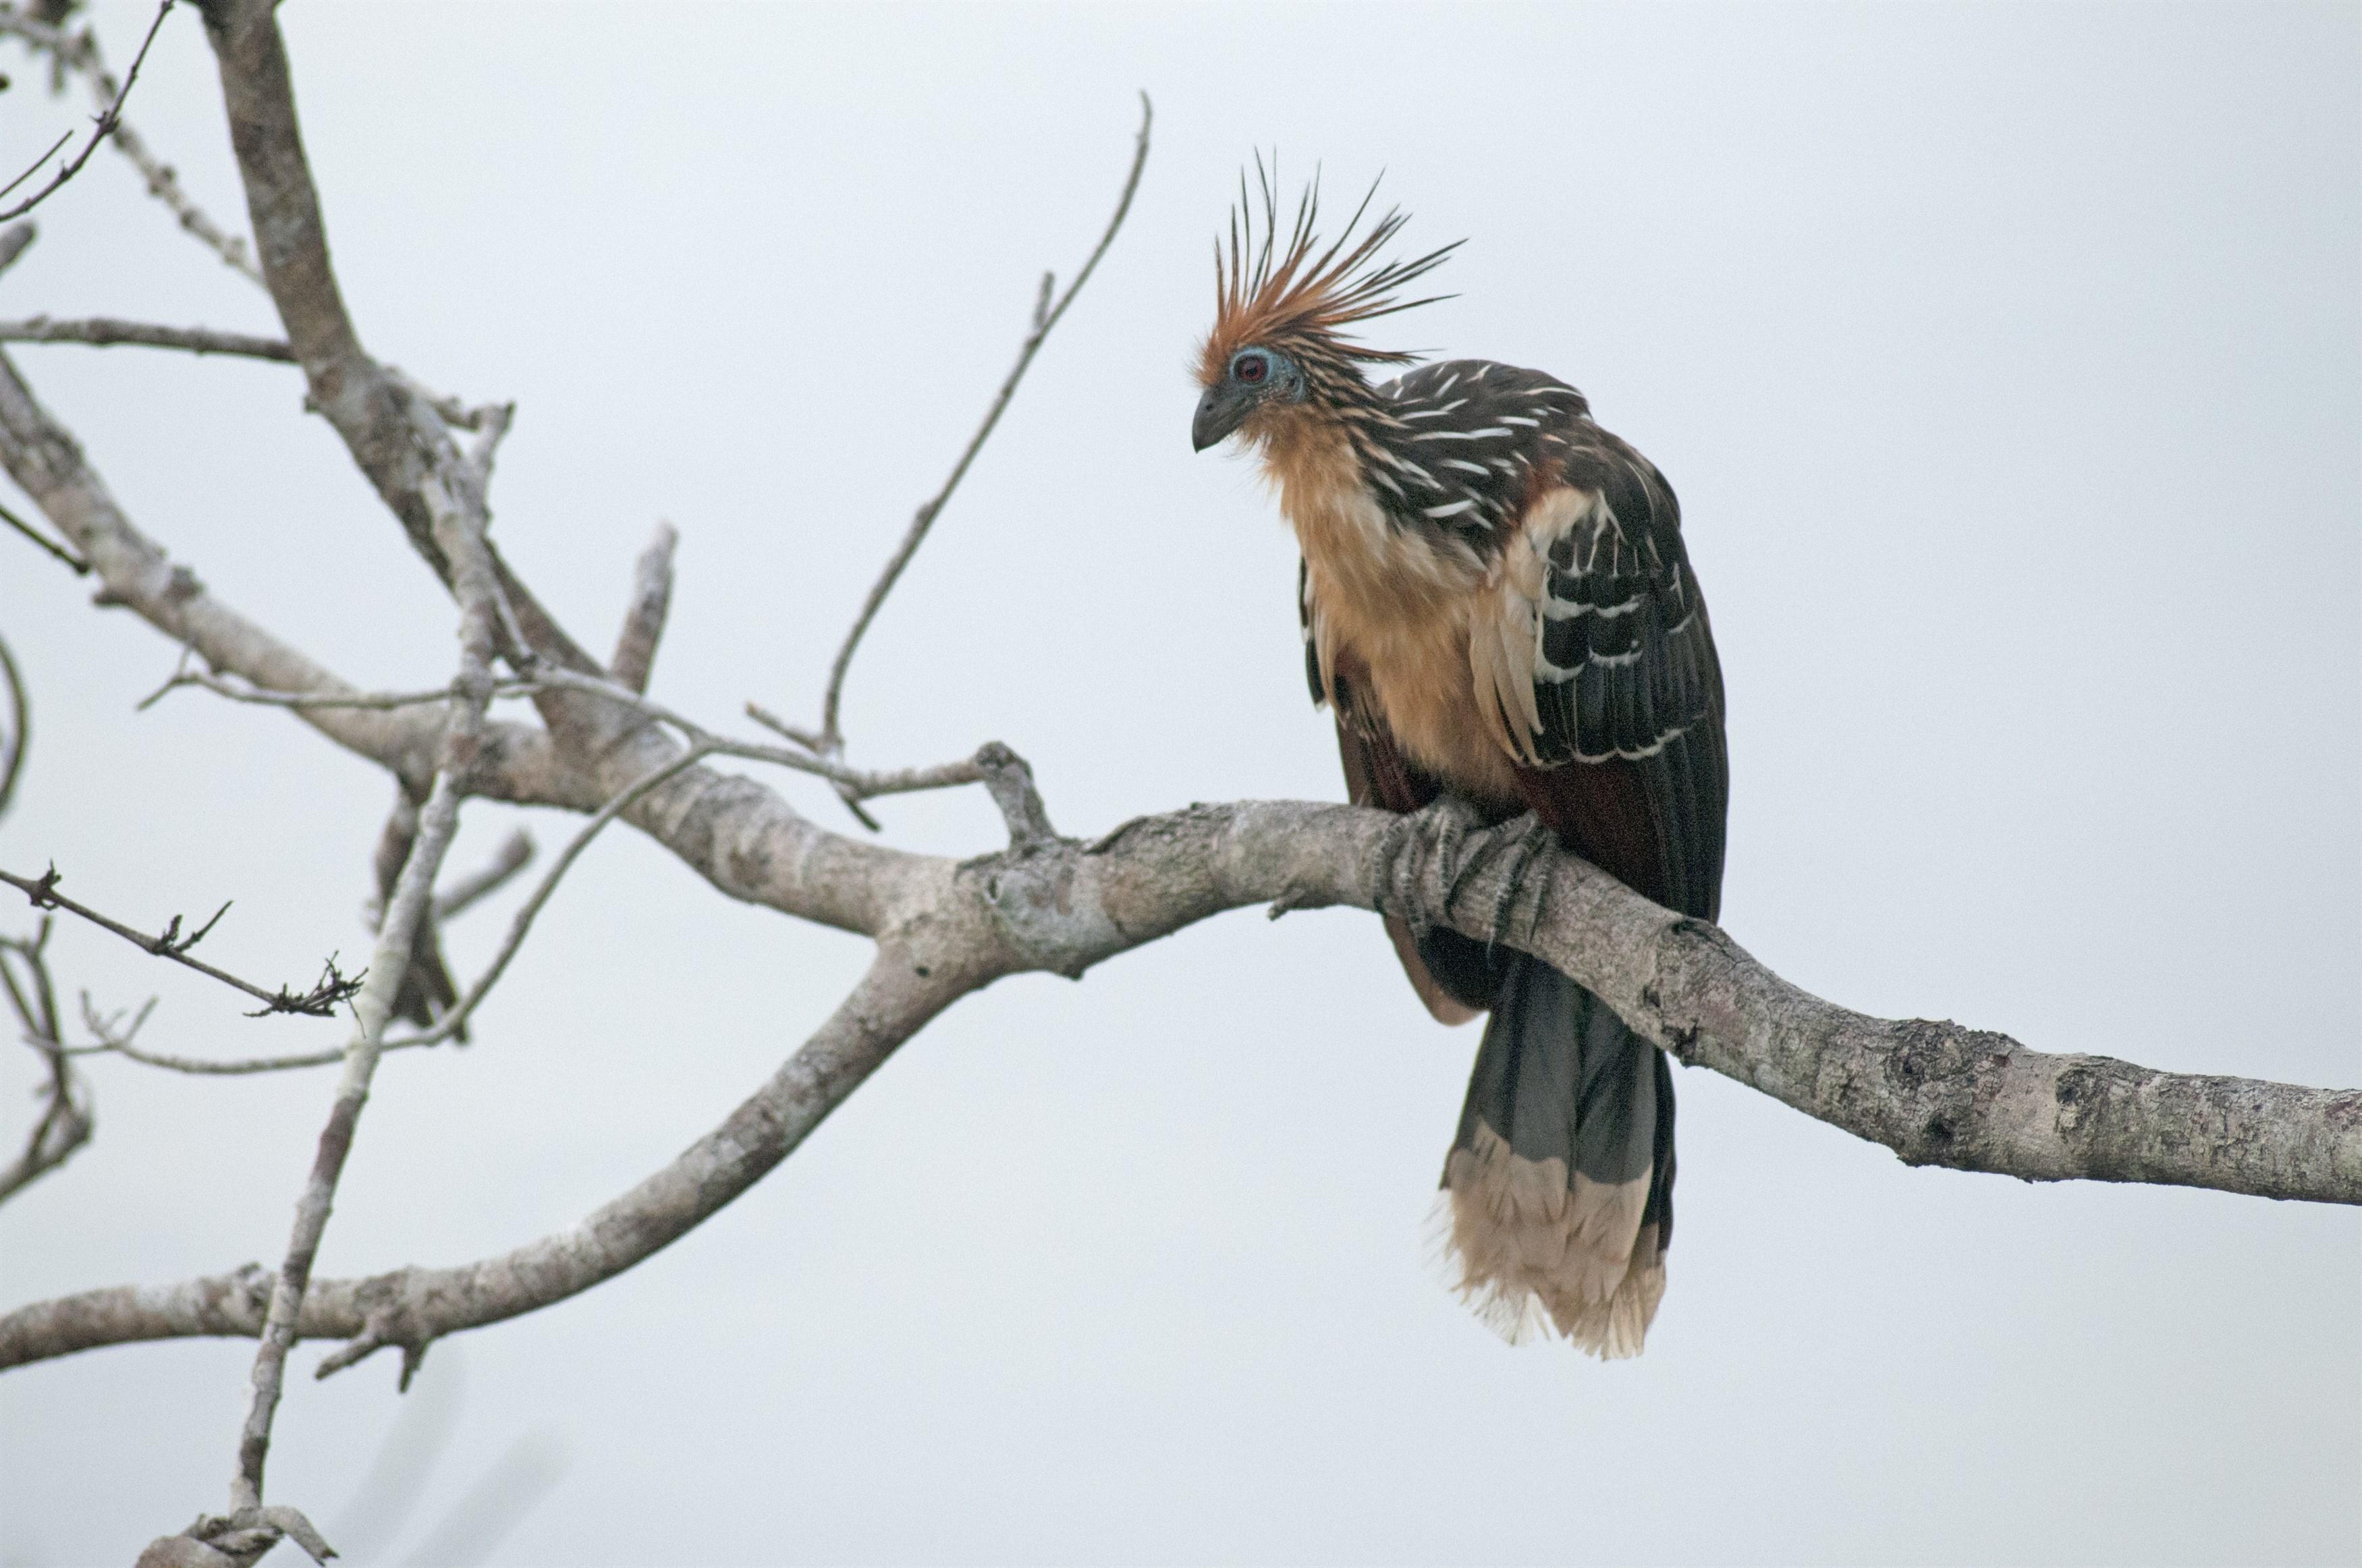 hoatzin-opisthocomus-hoazin-yasuni-national-park-ecuador_d727-3500x2324px